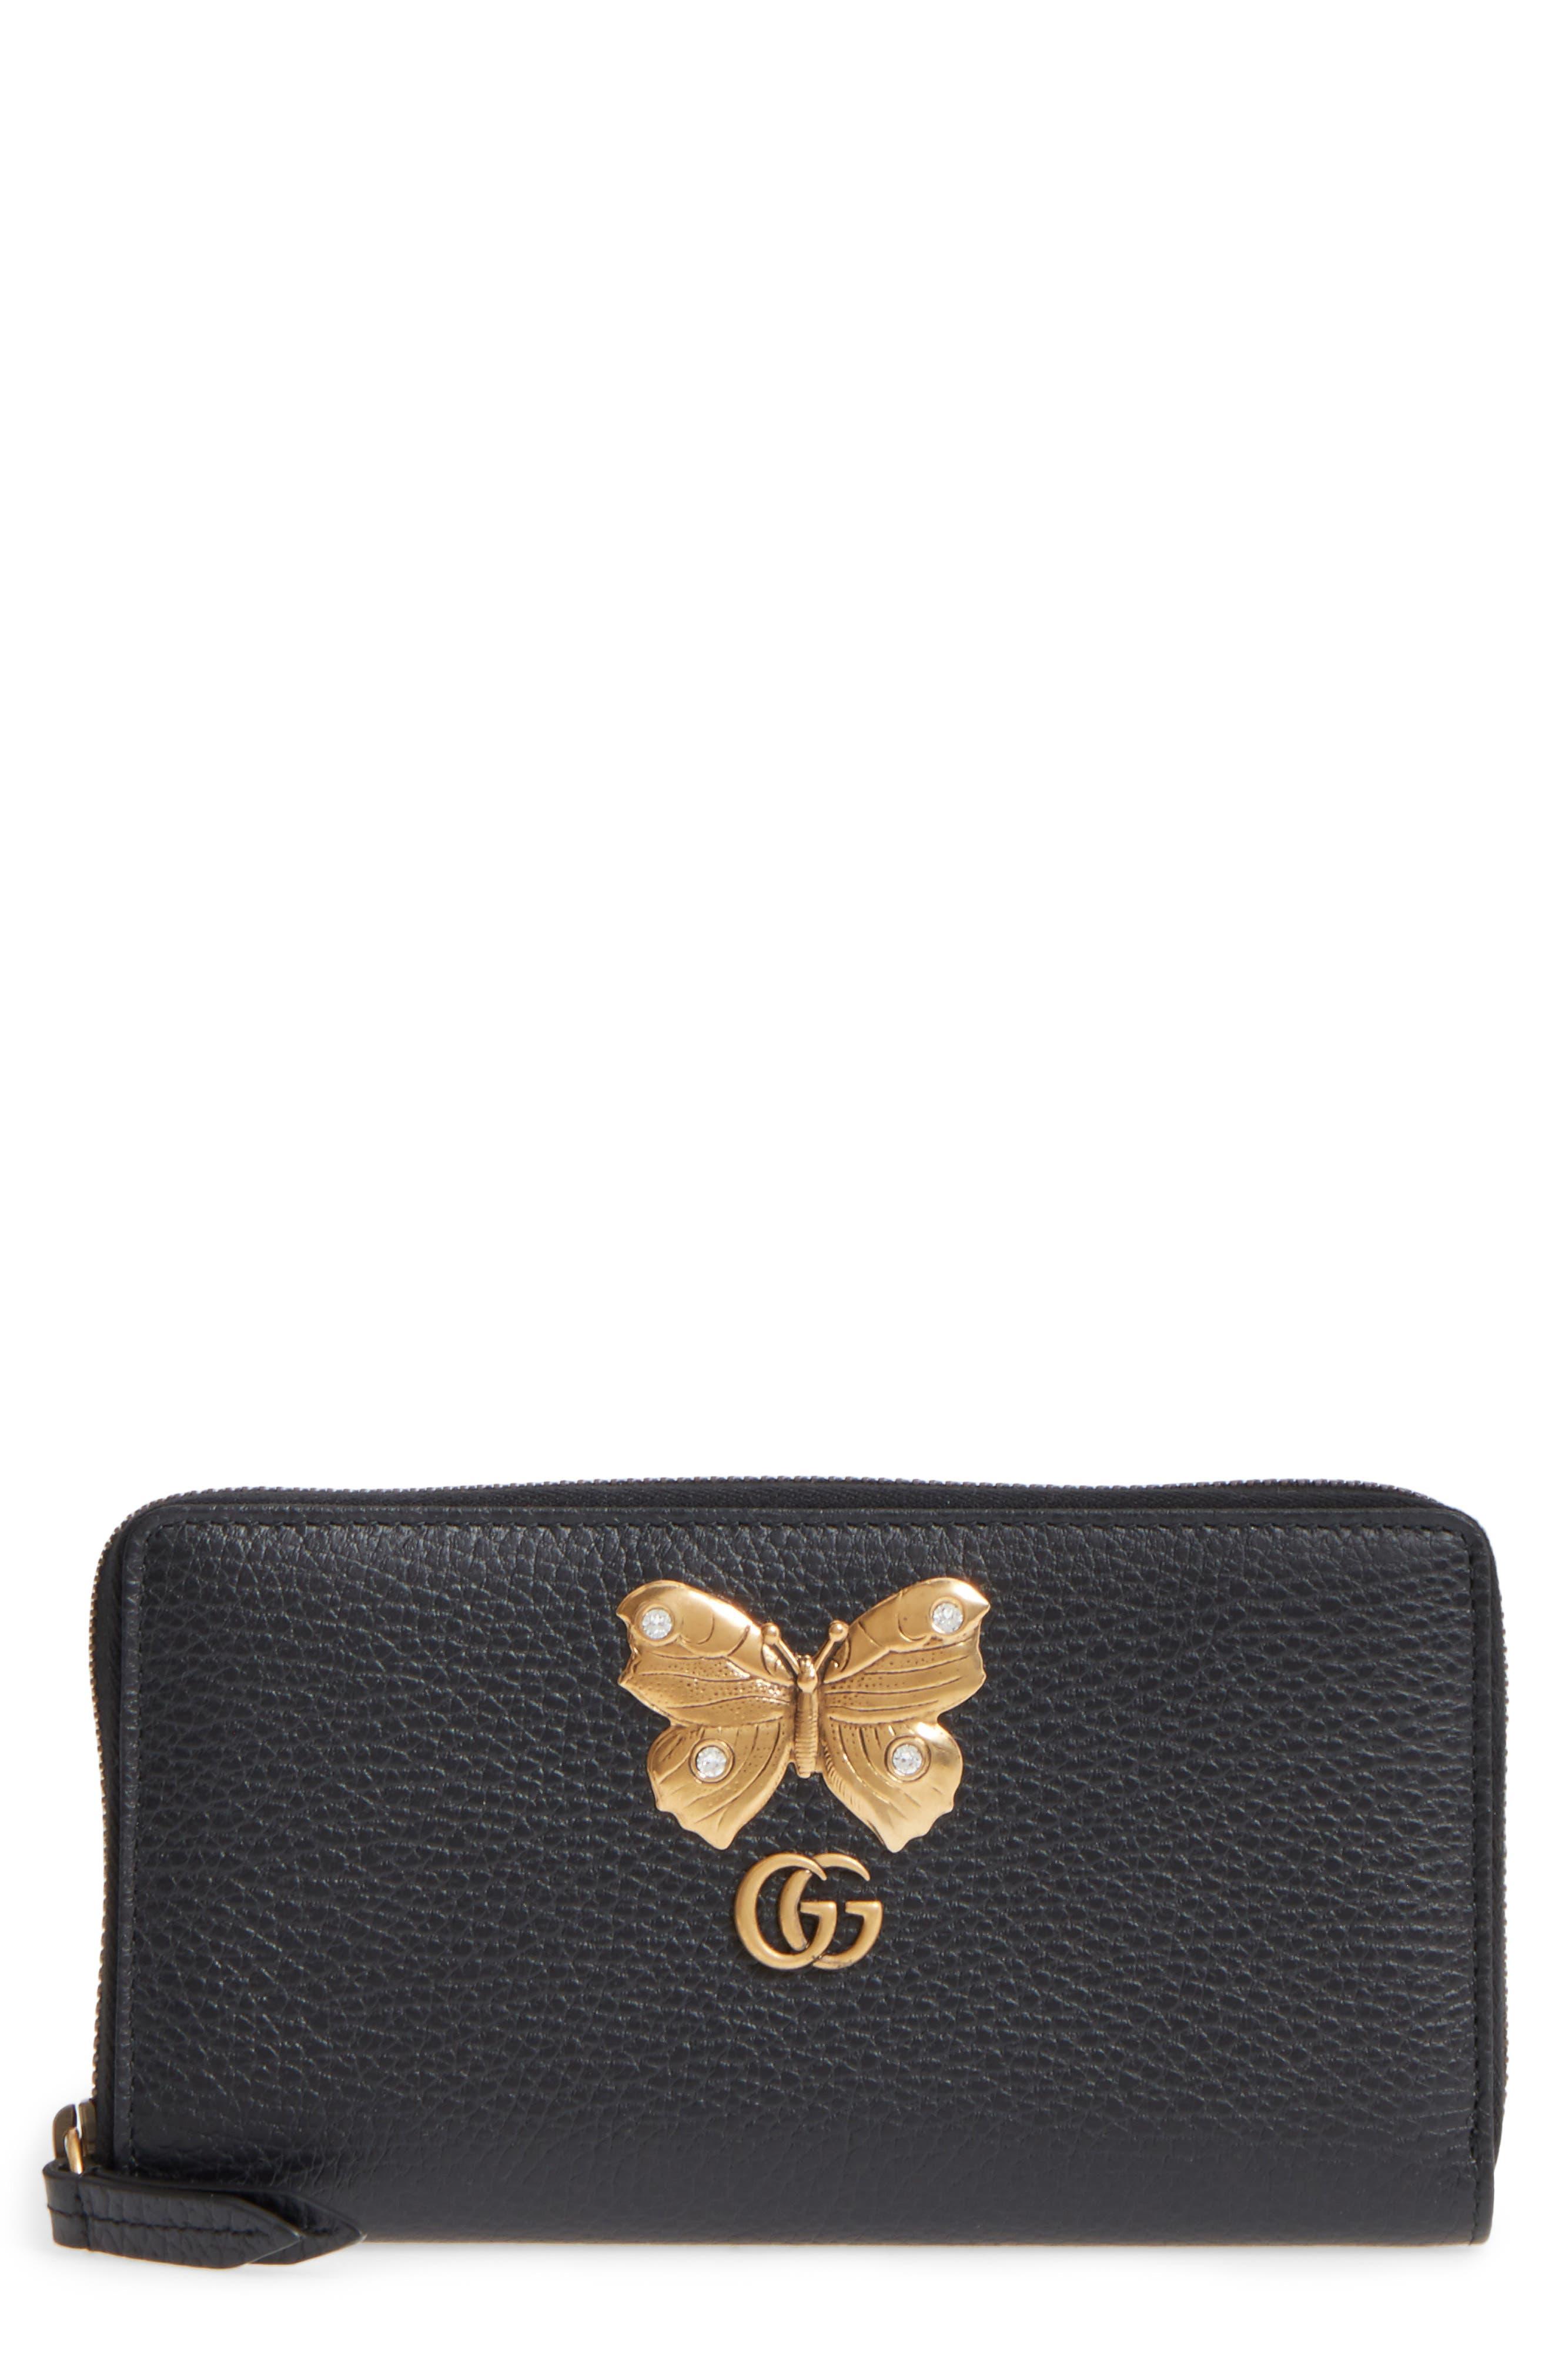 Farfalla Zip Around Leather Wallet,                         Main,                         color, NERO/ CRYSTAL